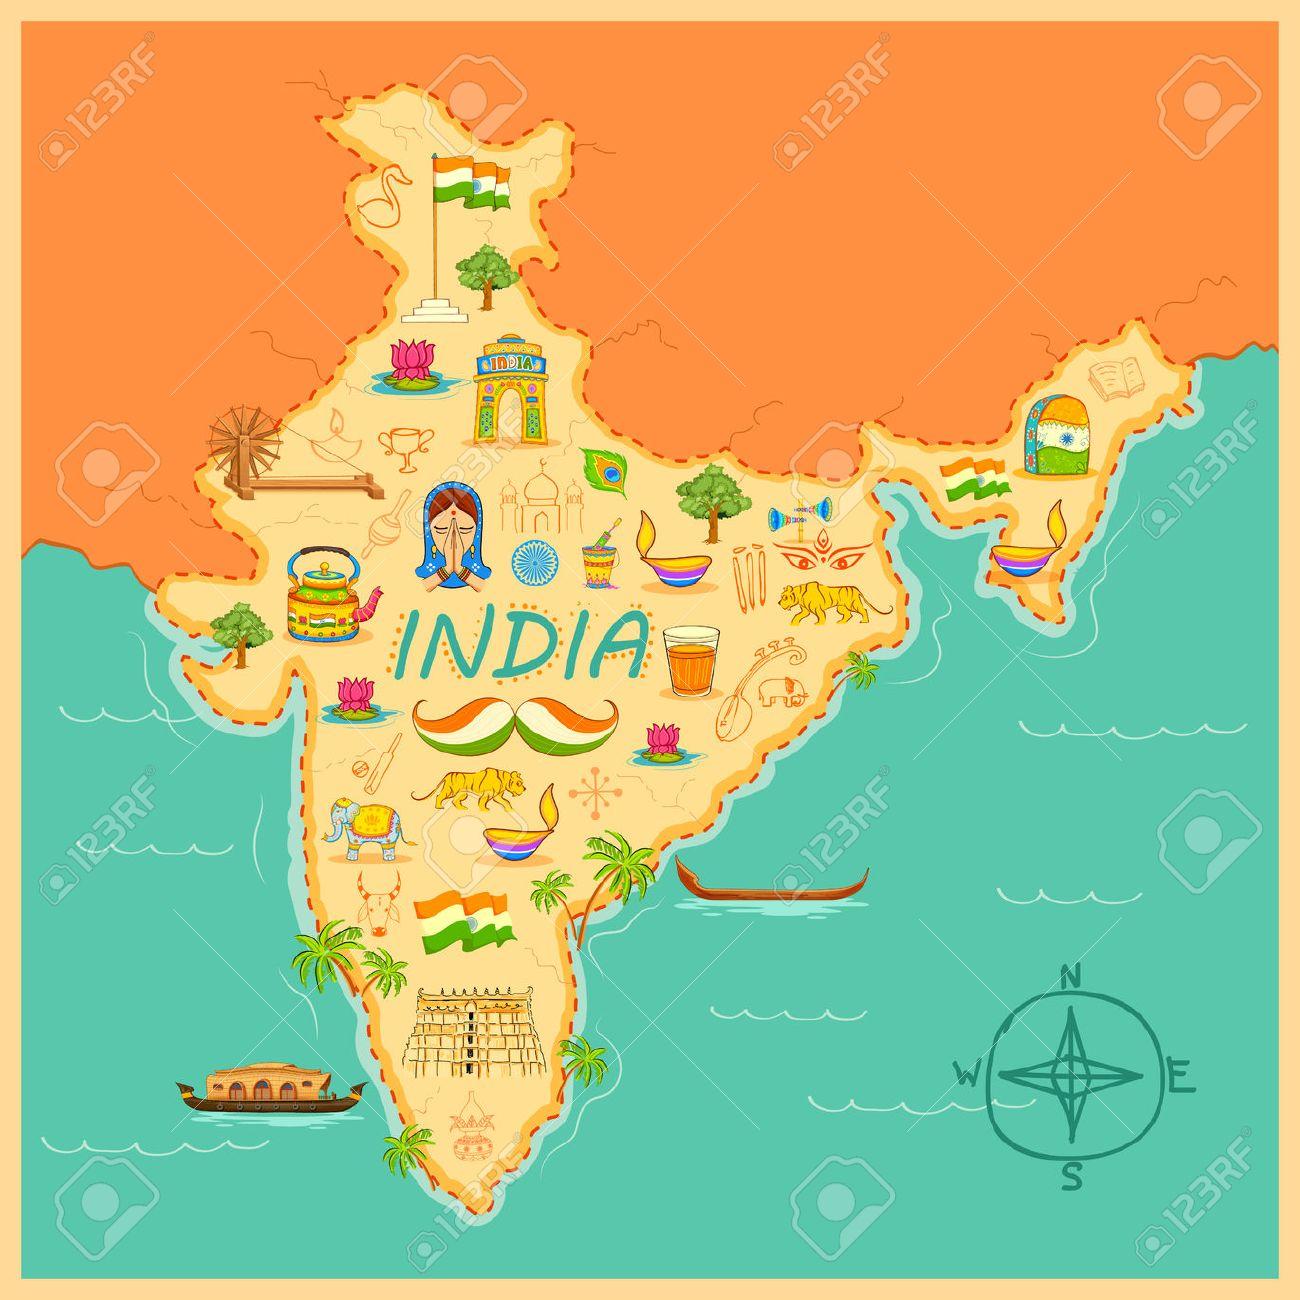 india mapa Illustration Of Kitsch Art Of Forming Map Of India Stock Photo  india mapa